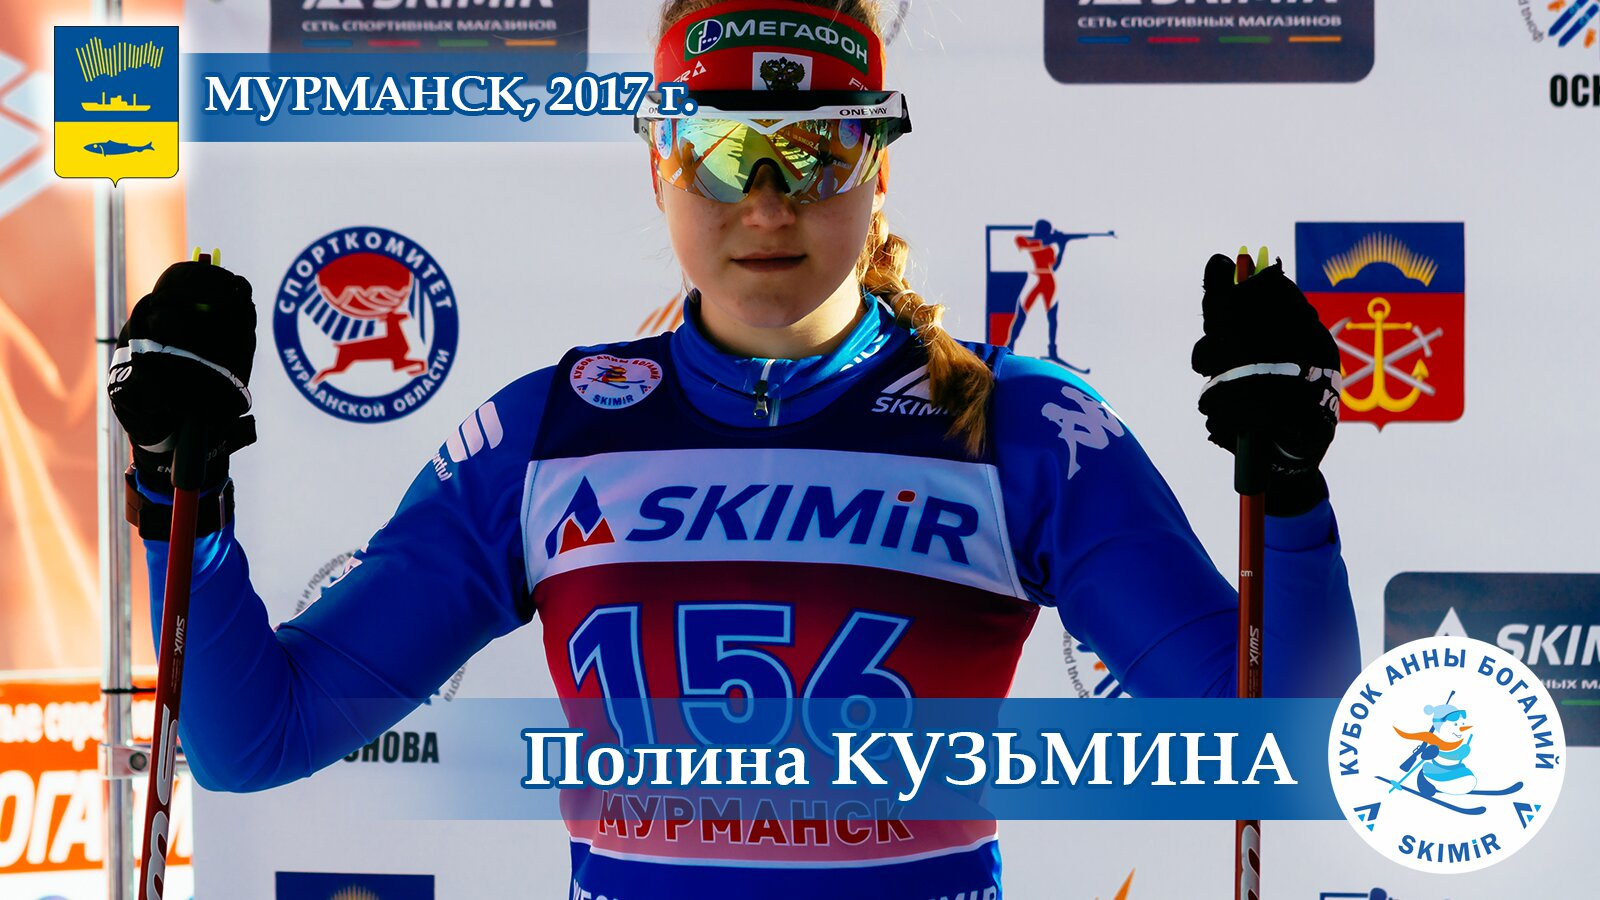 4 Полина Кузьмина _Красноярск.jpg